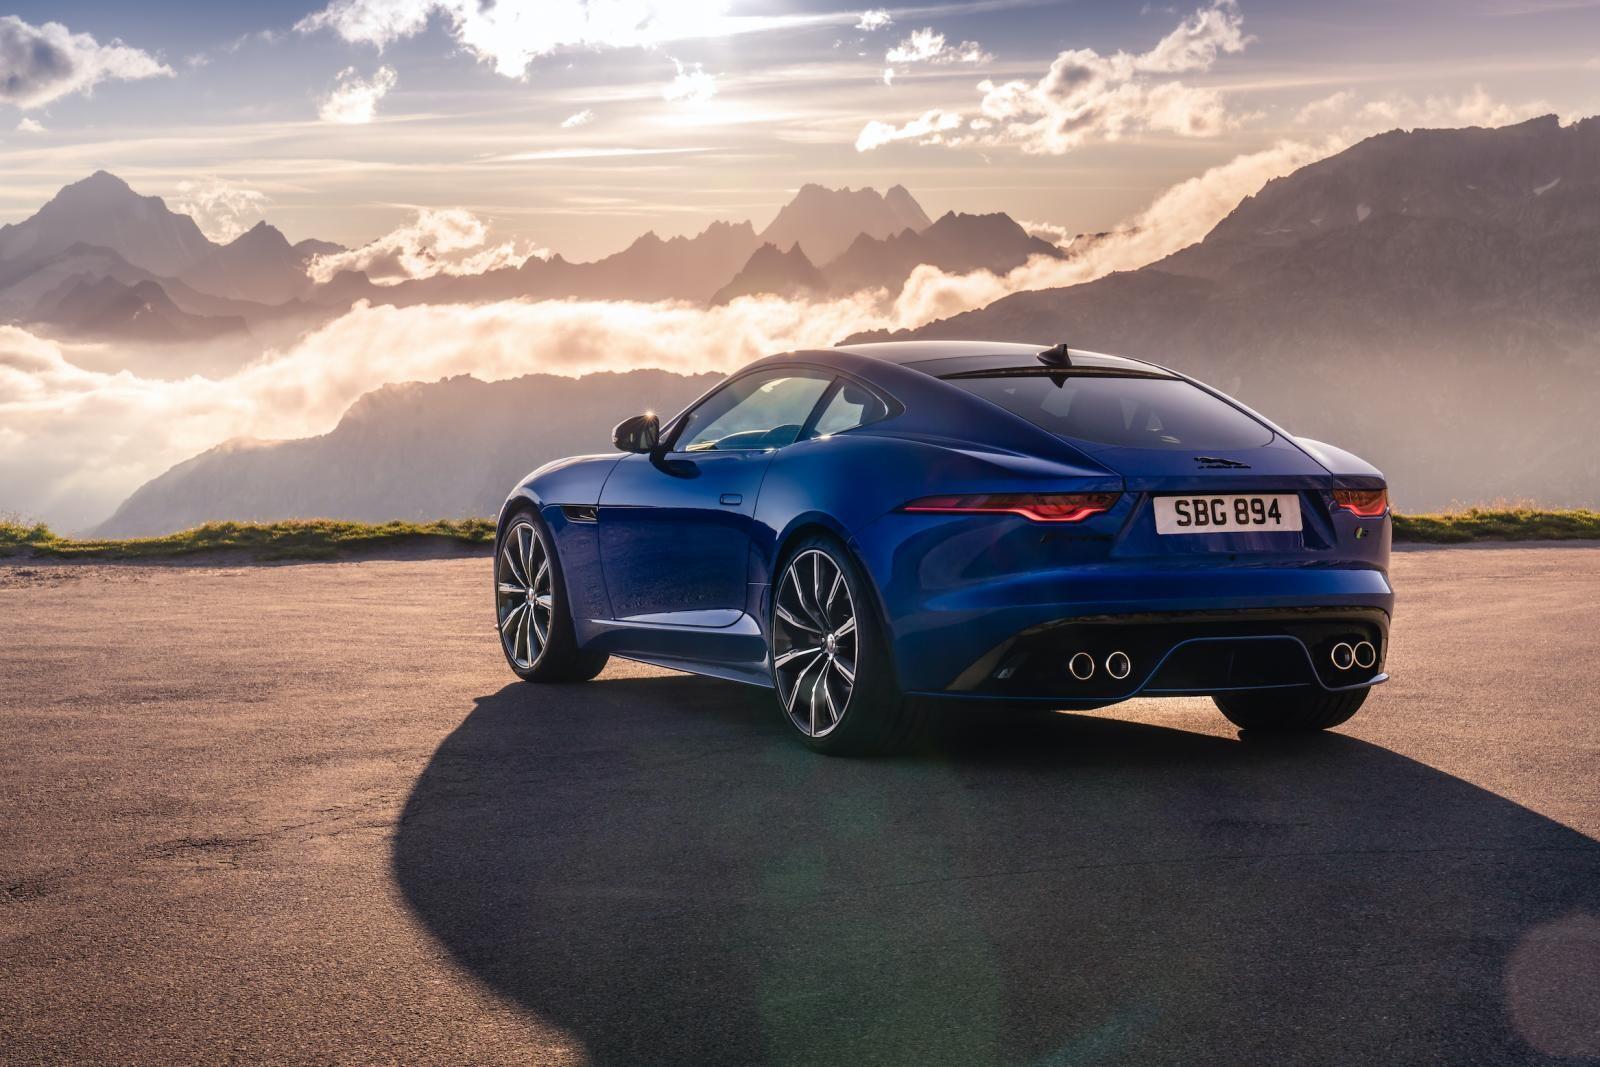 jaguar-ftype-2020-chinh-thuc-trinh-lang-voi-tong-cong-16-phien-ban-3.jpg